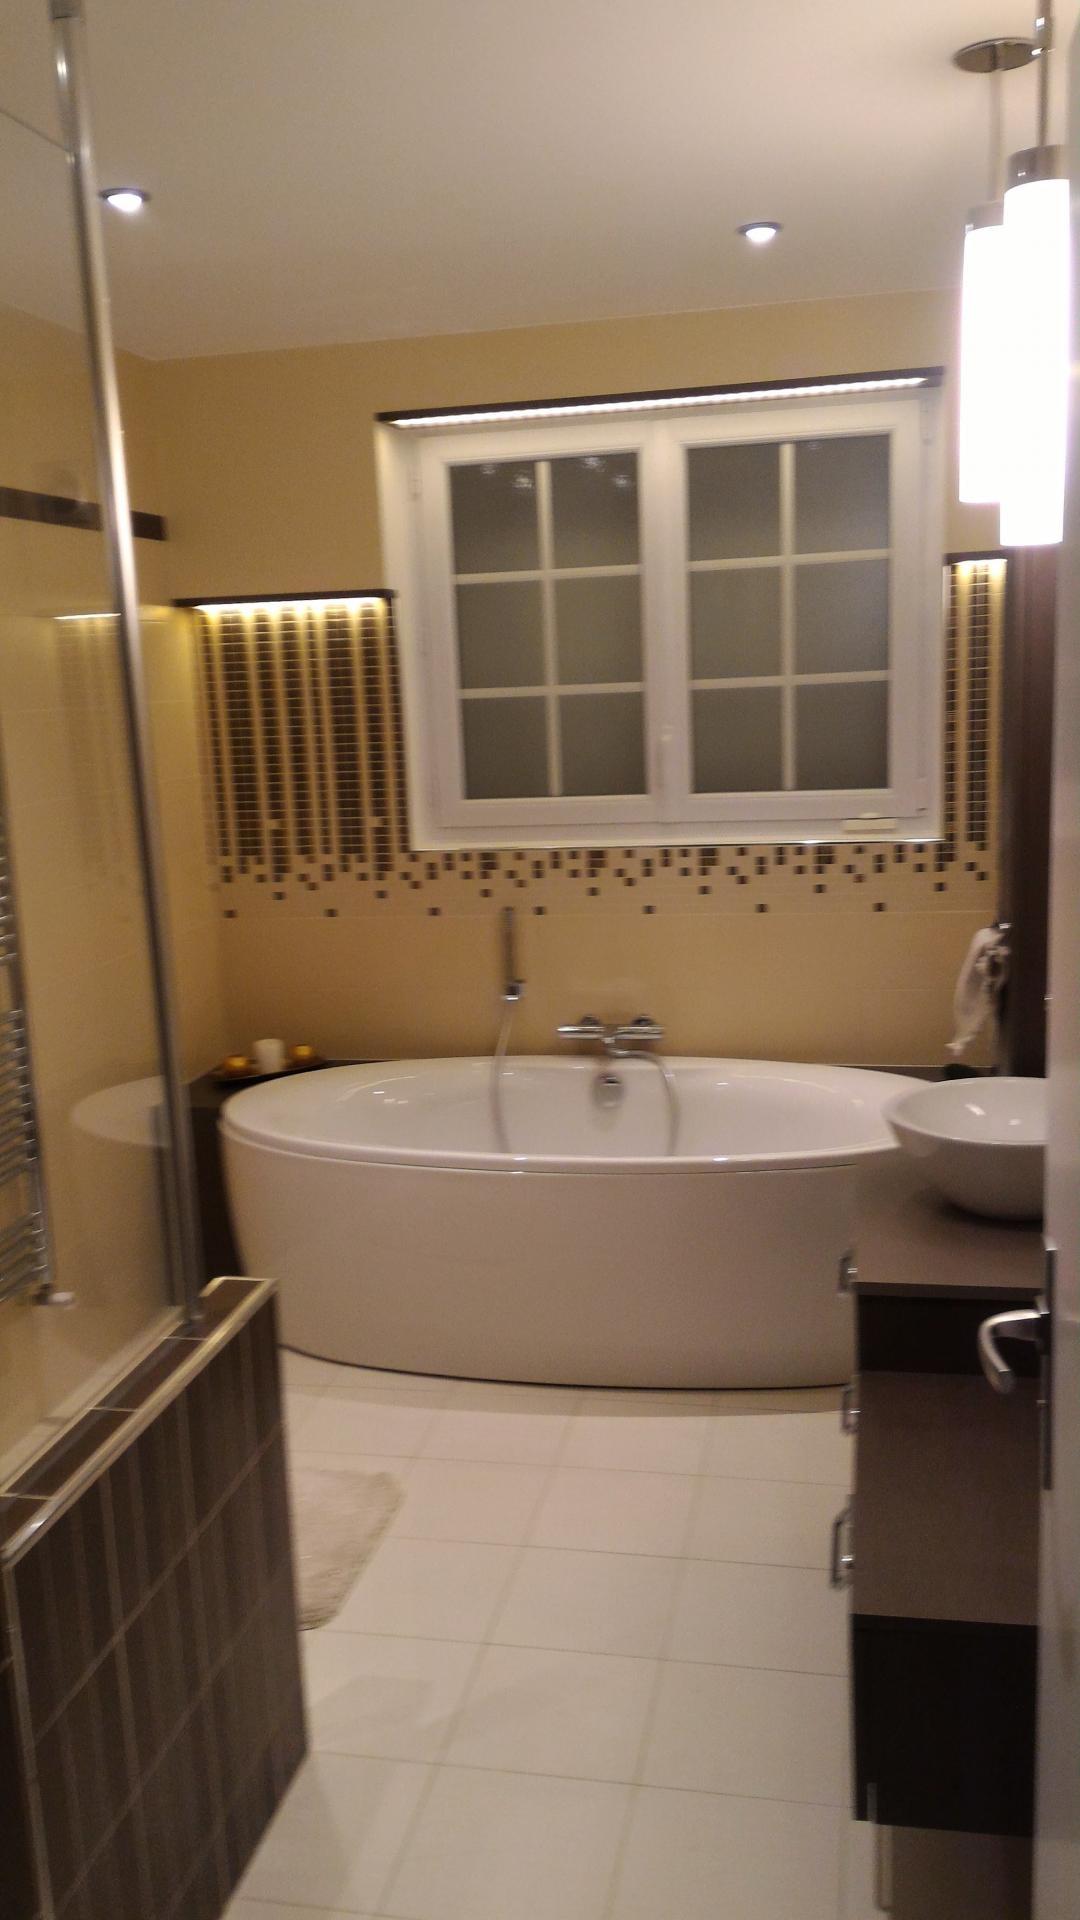 ruault alexandre ma on reuilly. Black Bedroom Furniture Sets. Home Design Ideas